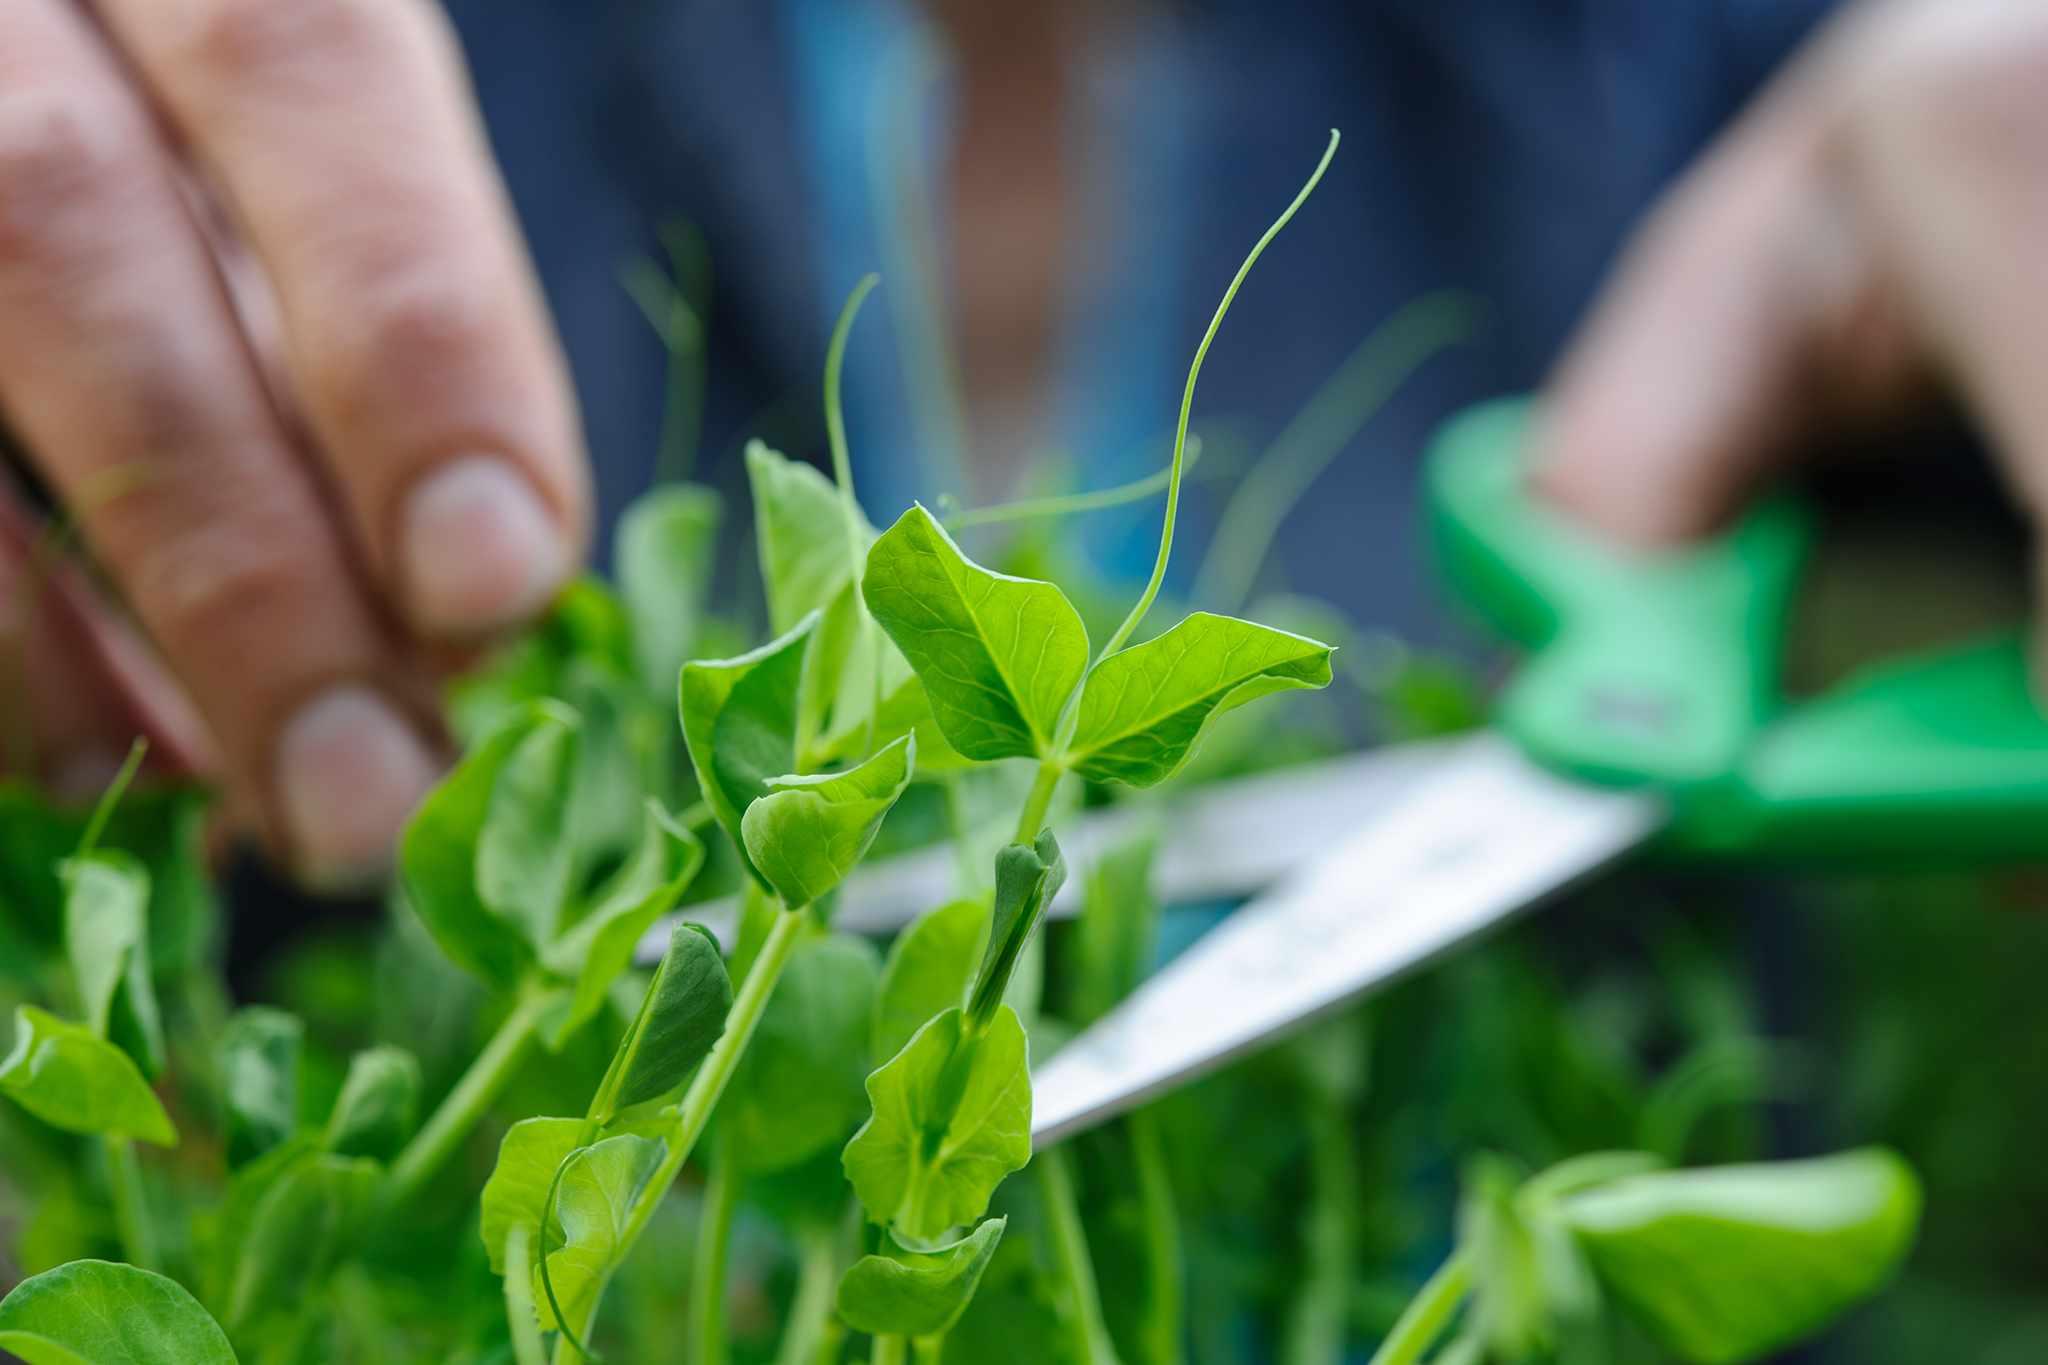 Harvesting microgreens